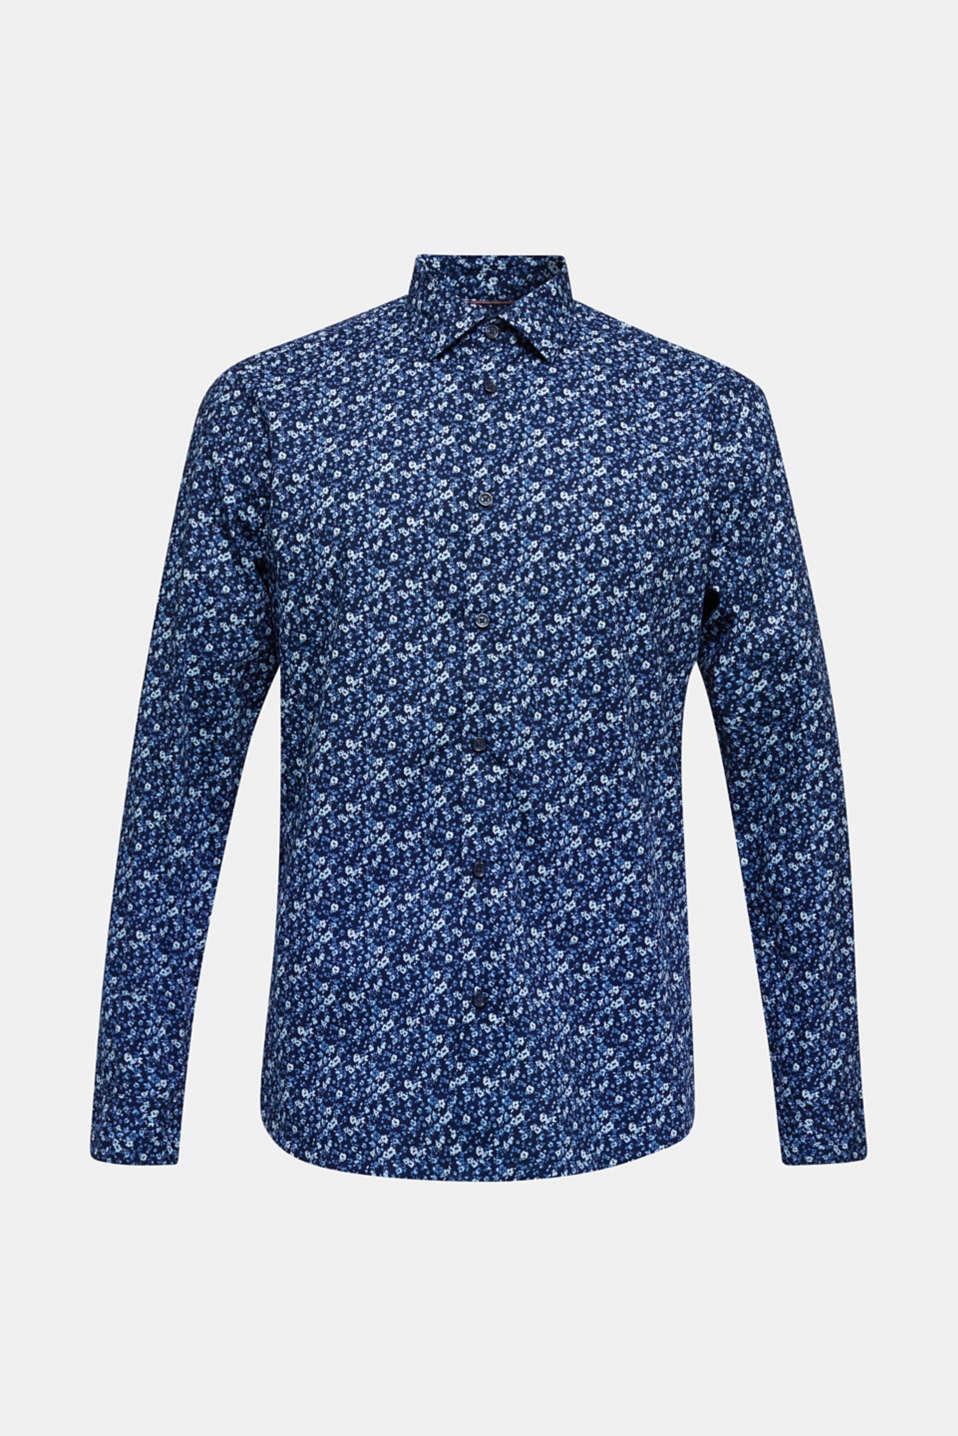 Premium shirt with a floral print, 100% cotton, DARK BLUE 4, detail image number 7